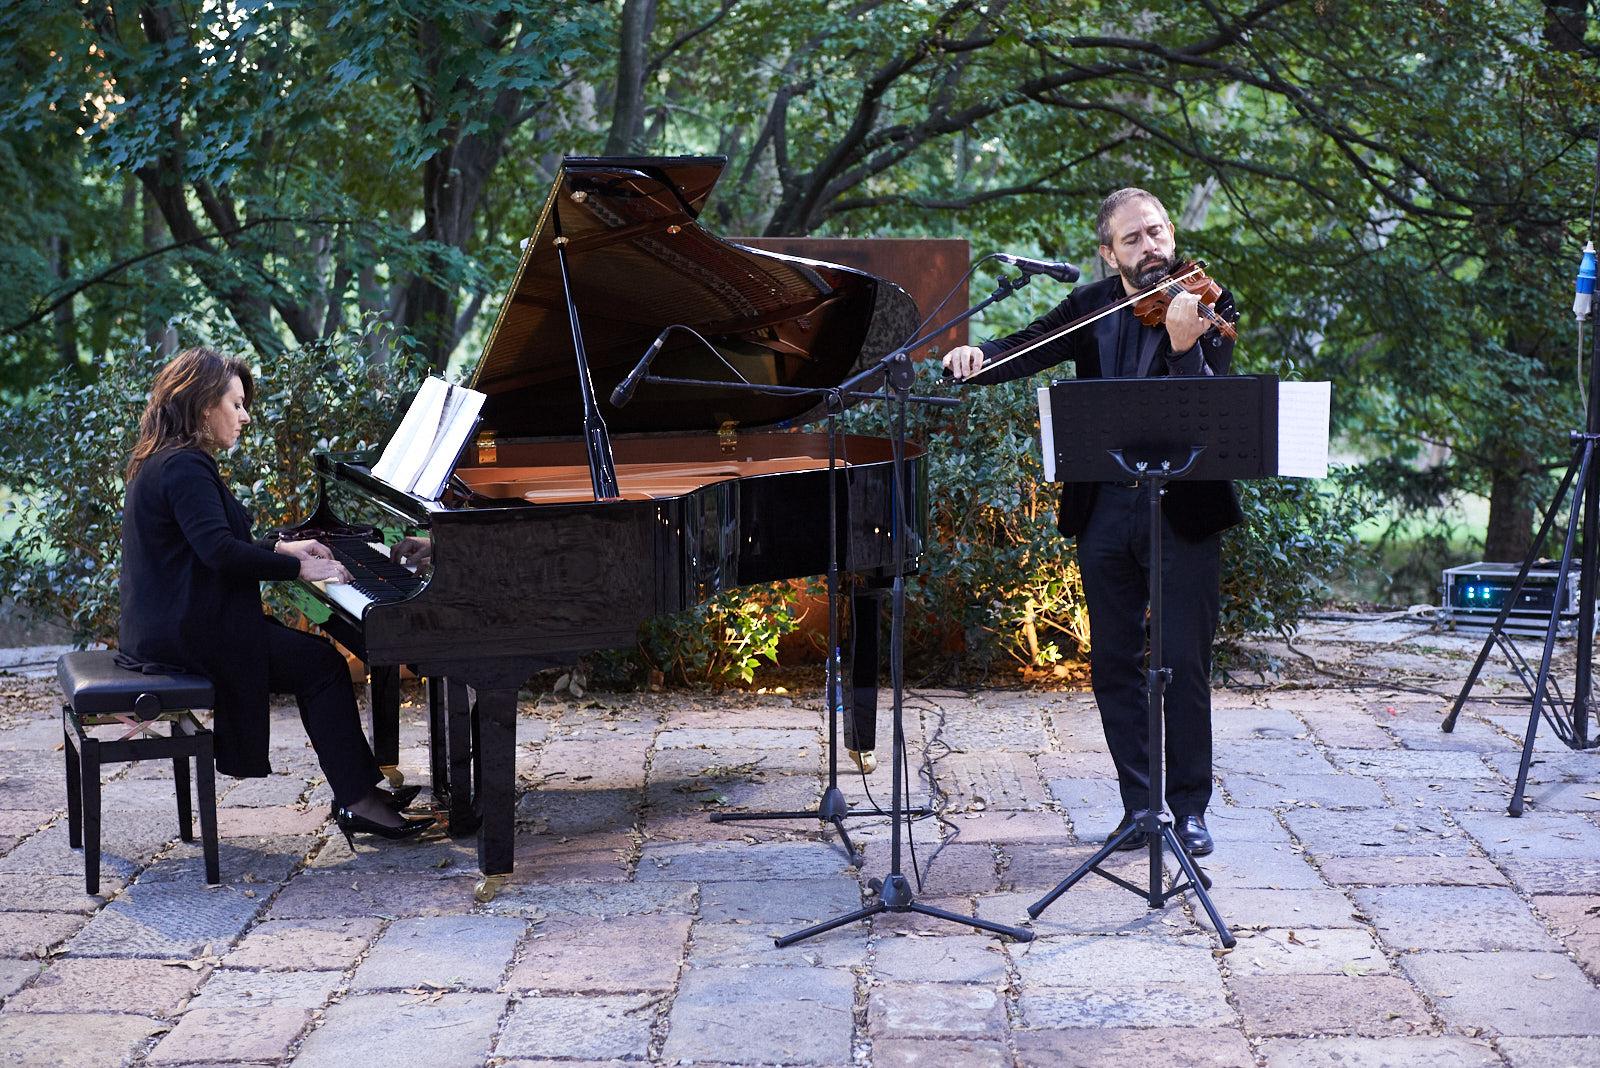 The Lazzaroni Duo. Pianist: Angela Lazzaroni. Violinist: Carlo Lazzaroni